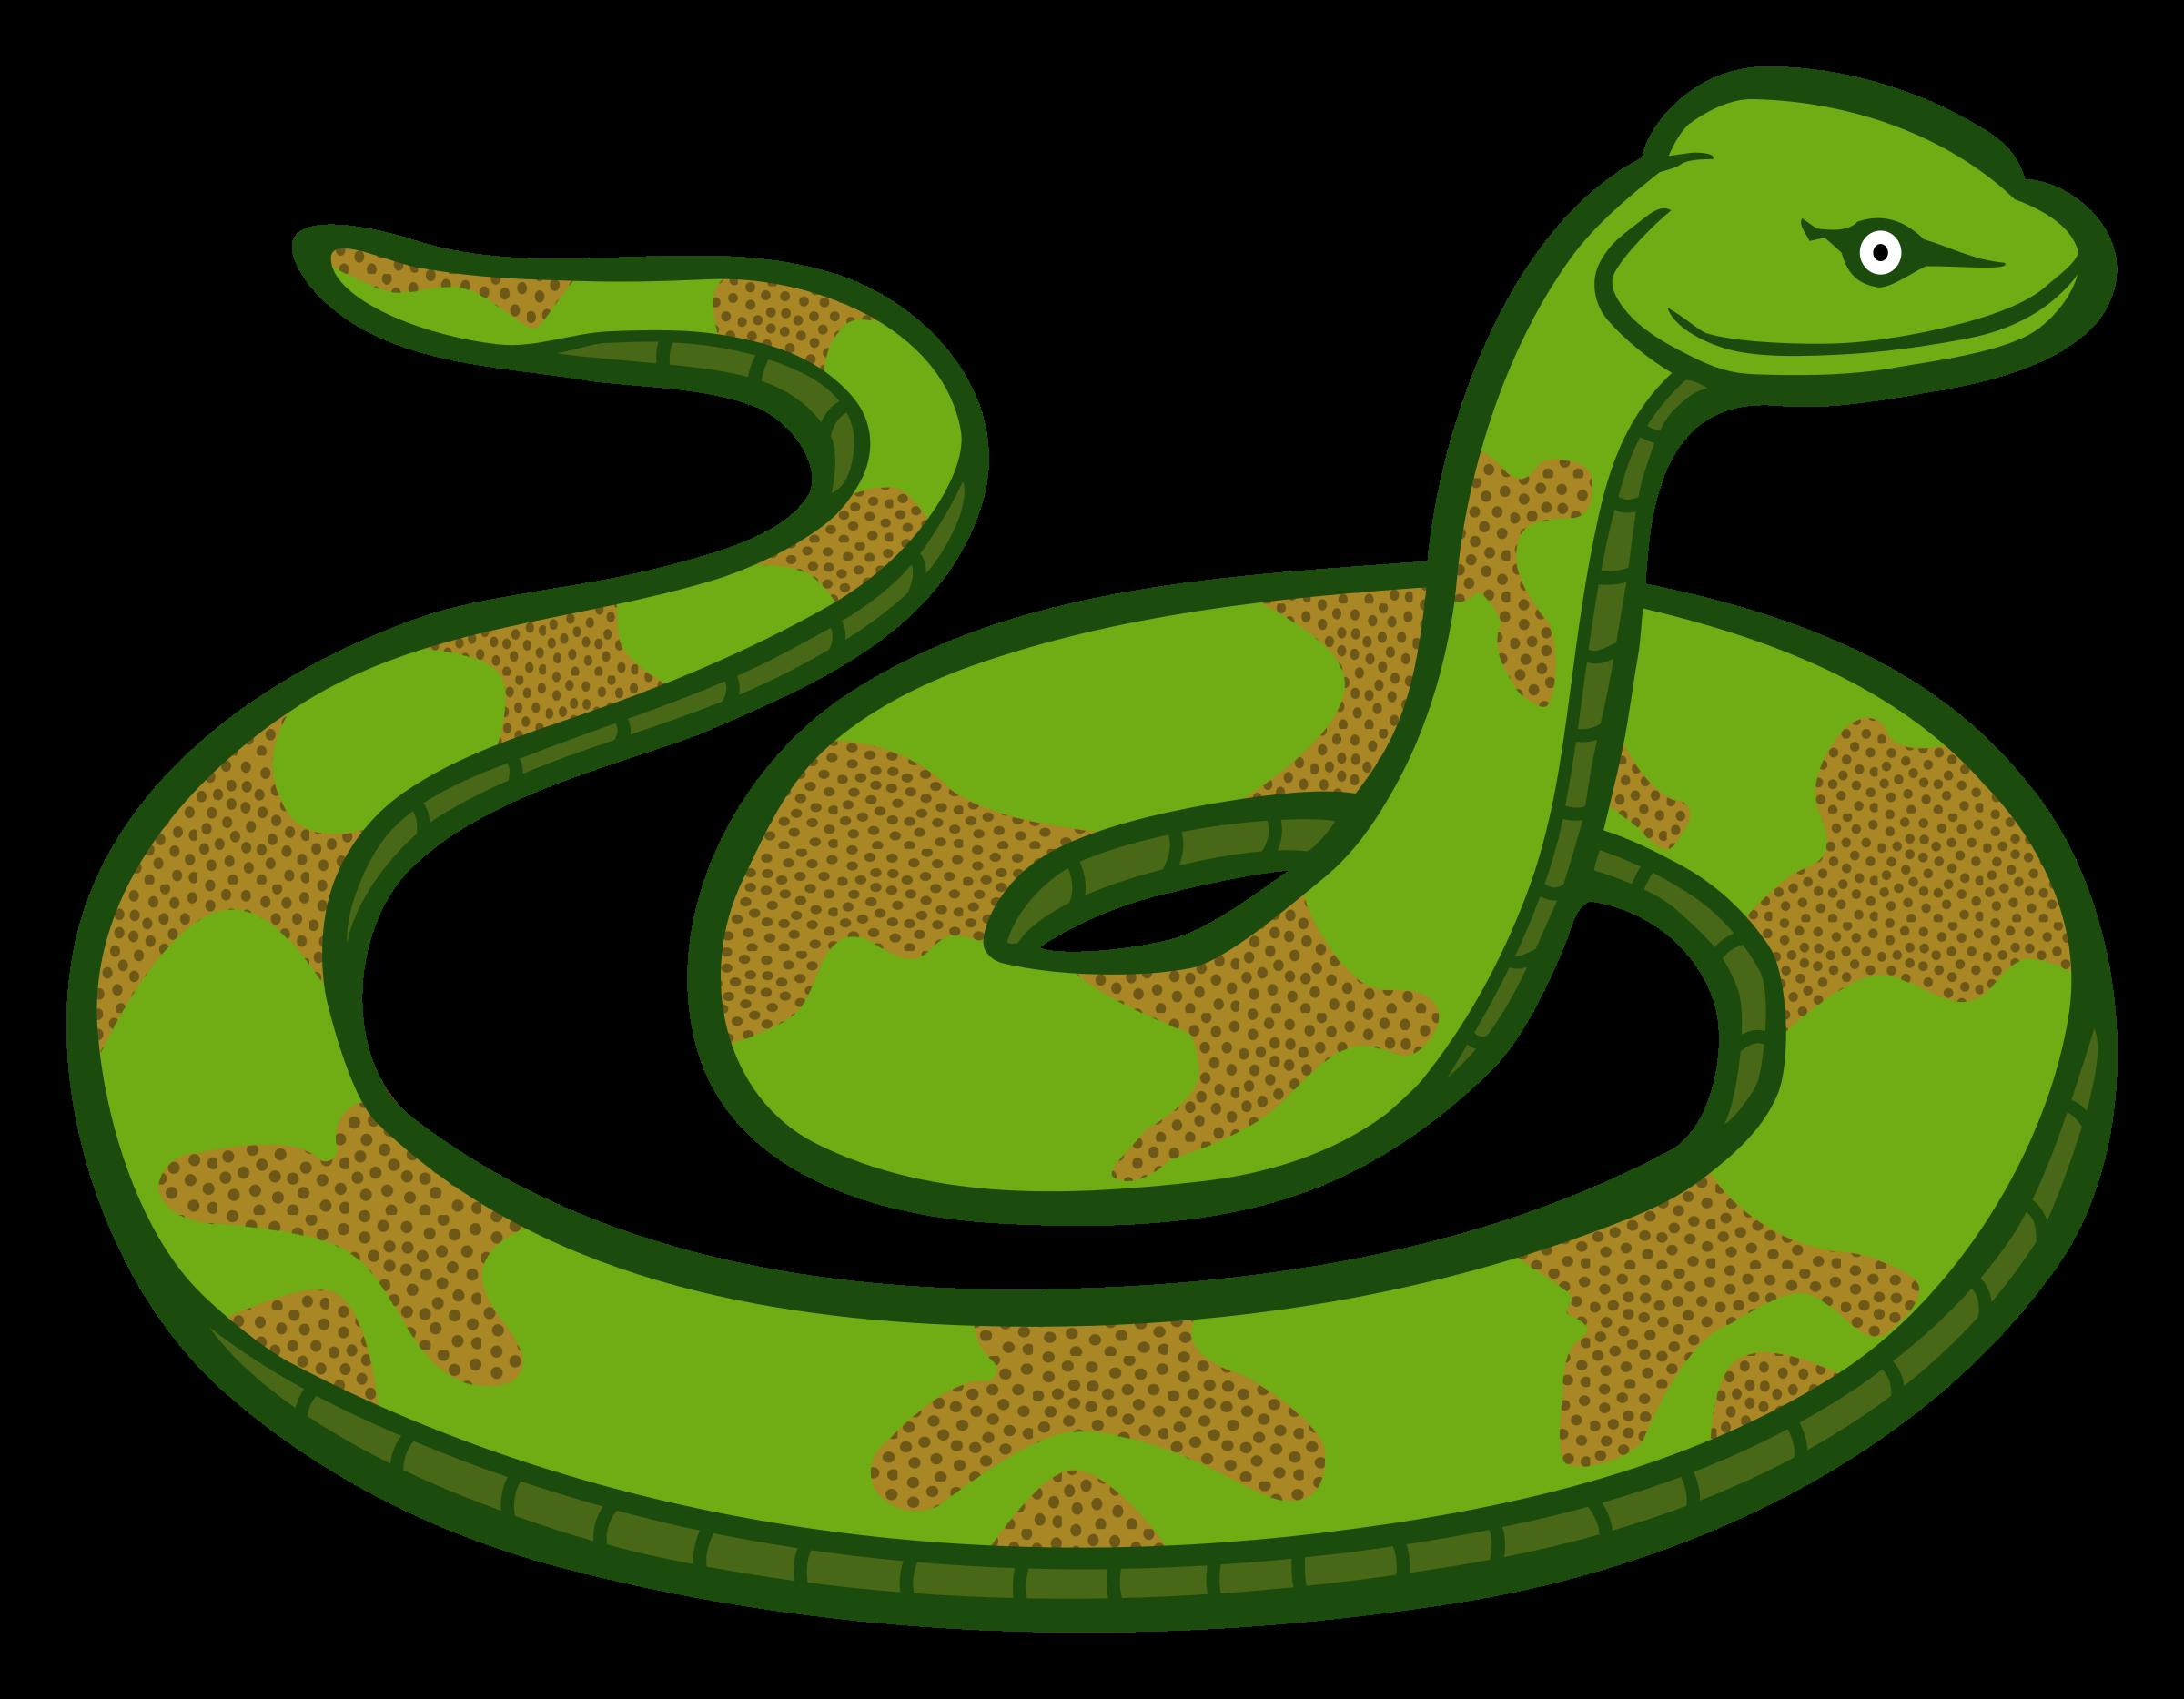 Transparent snake clipart 2-Transparent snake clipart 2-12